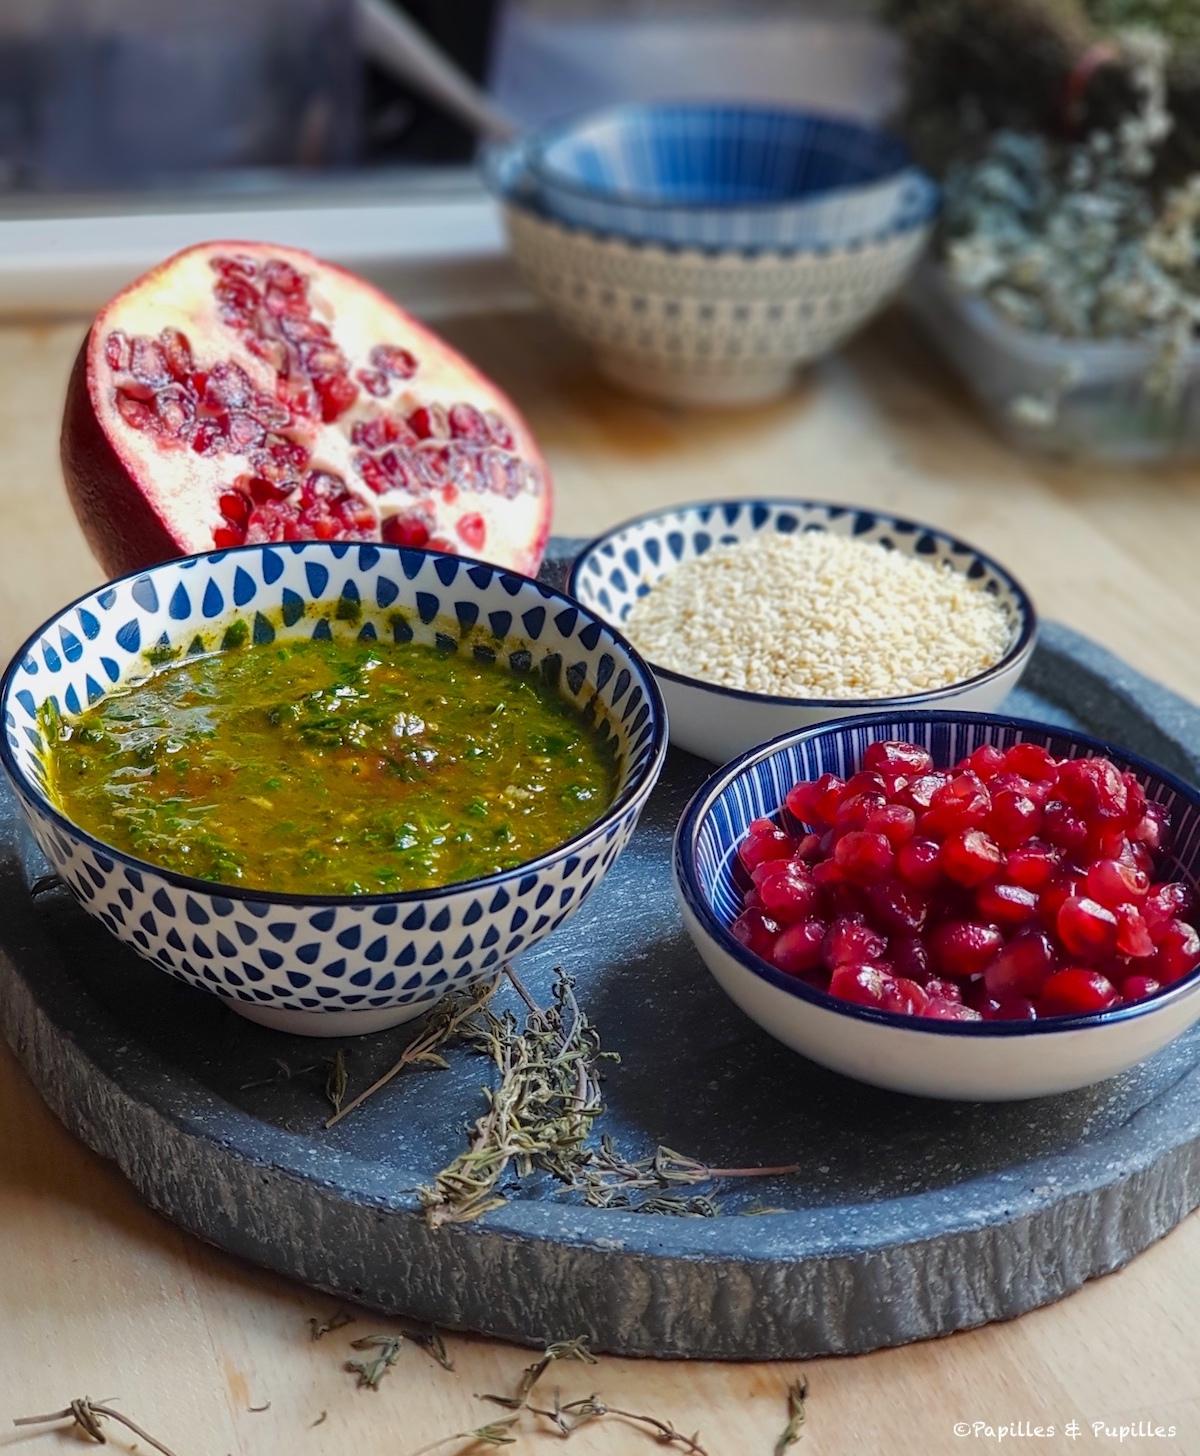 Sauce ail persil, grains de sésame, de grenade